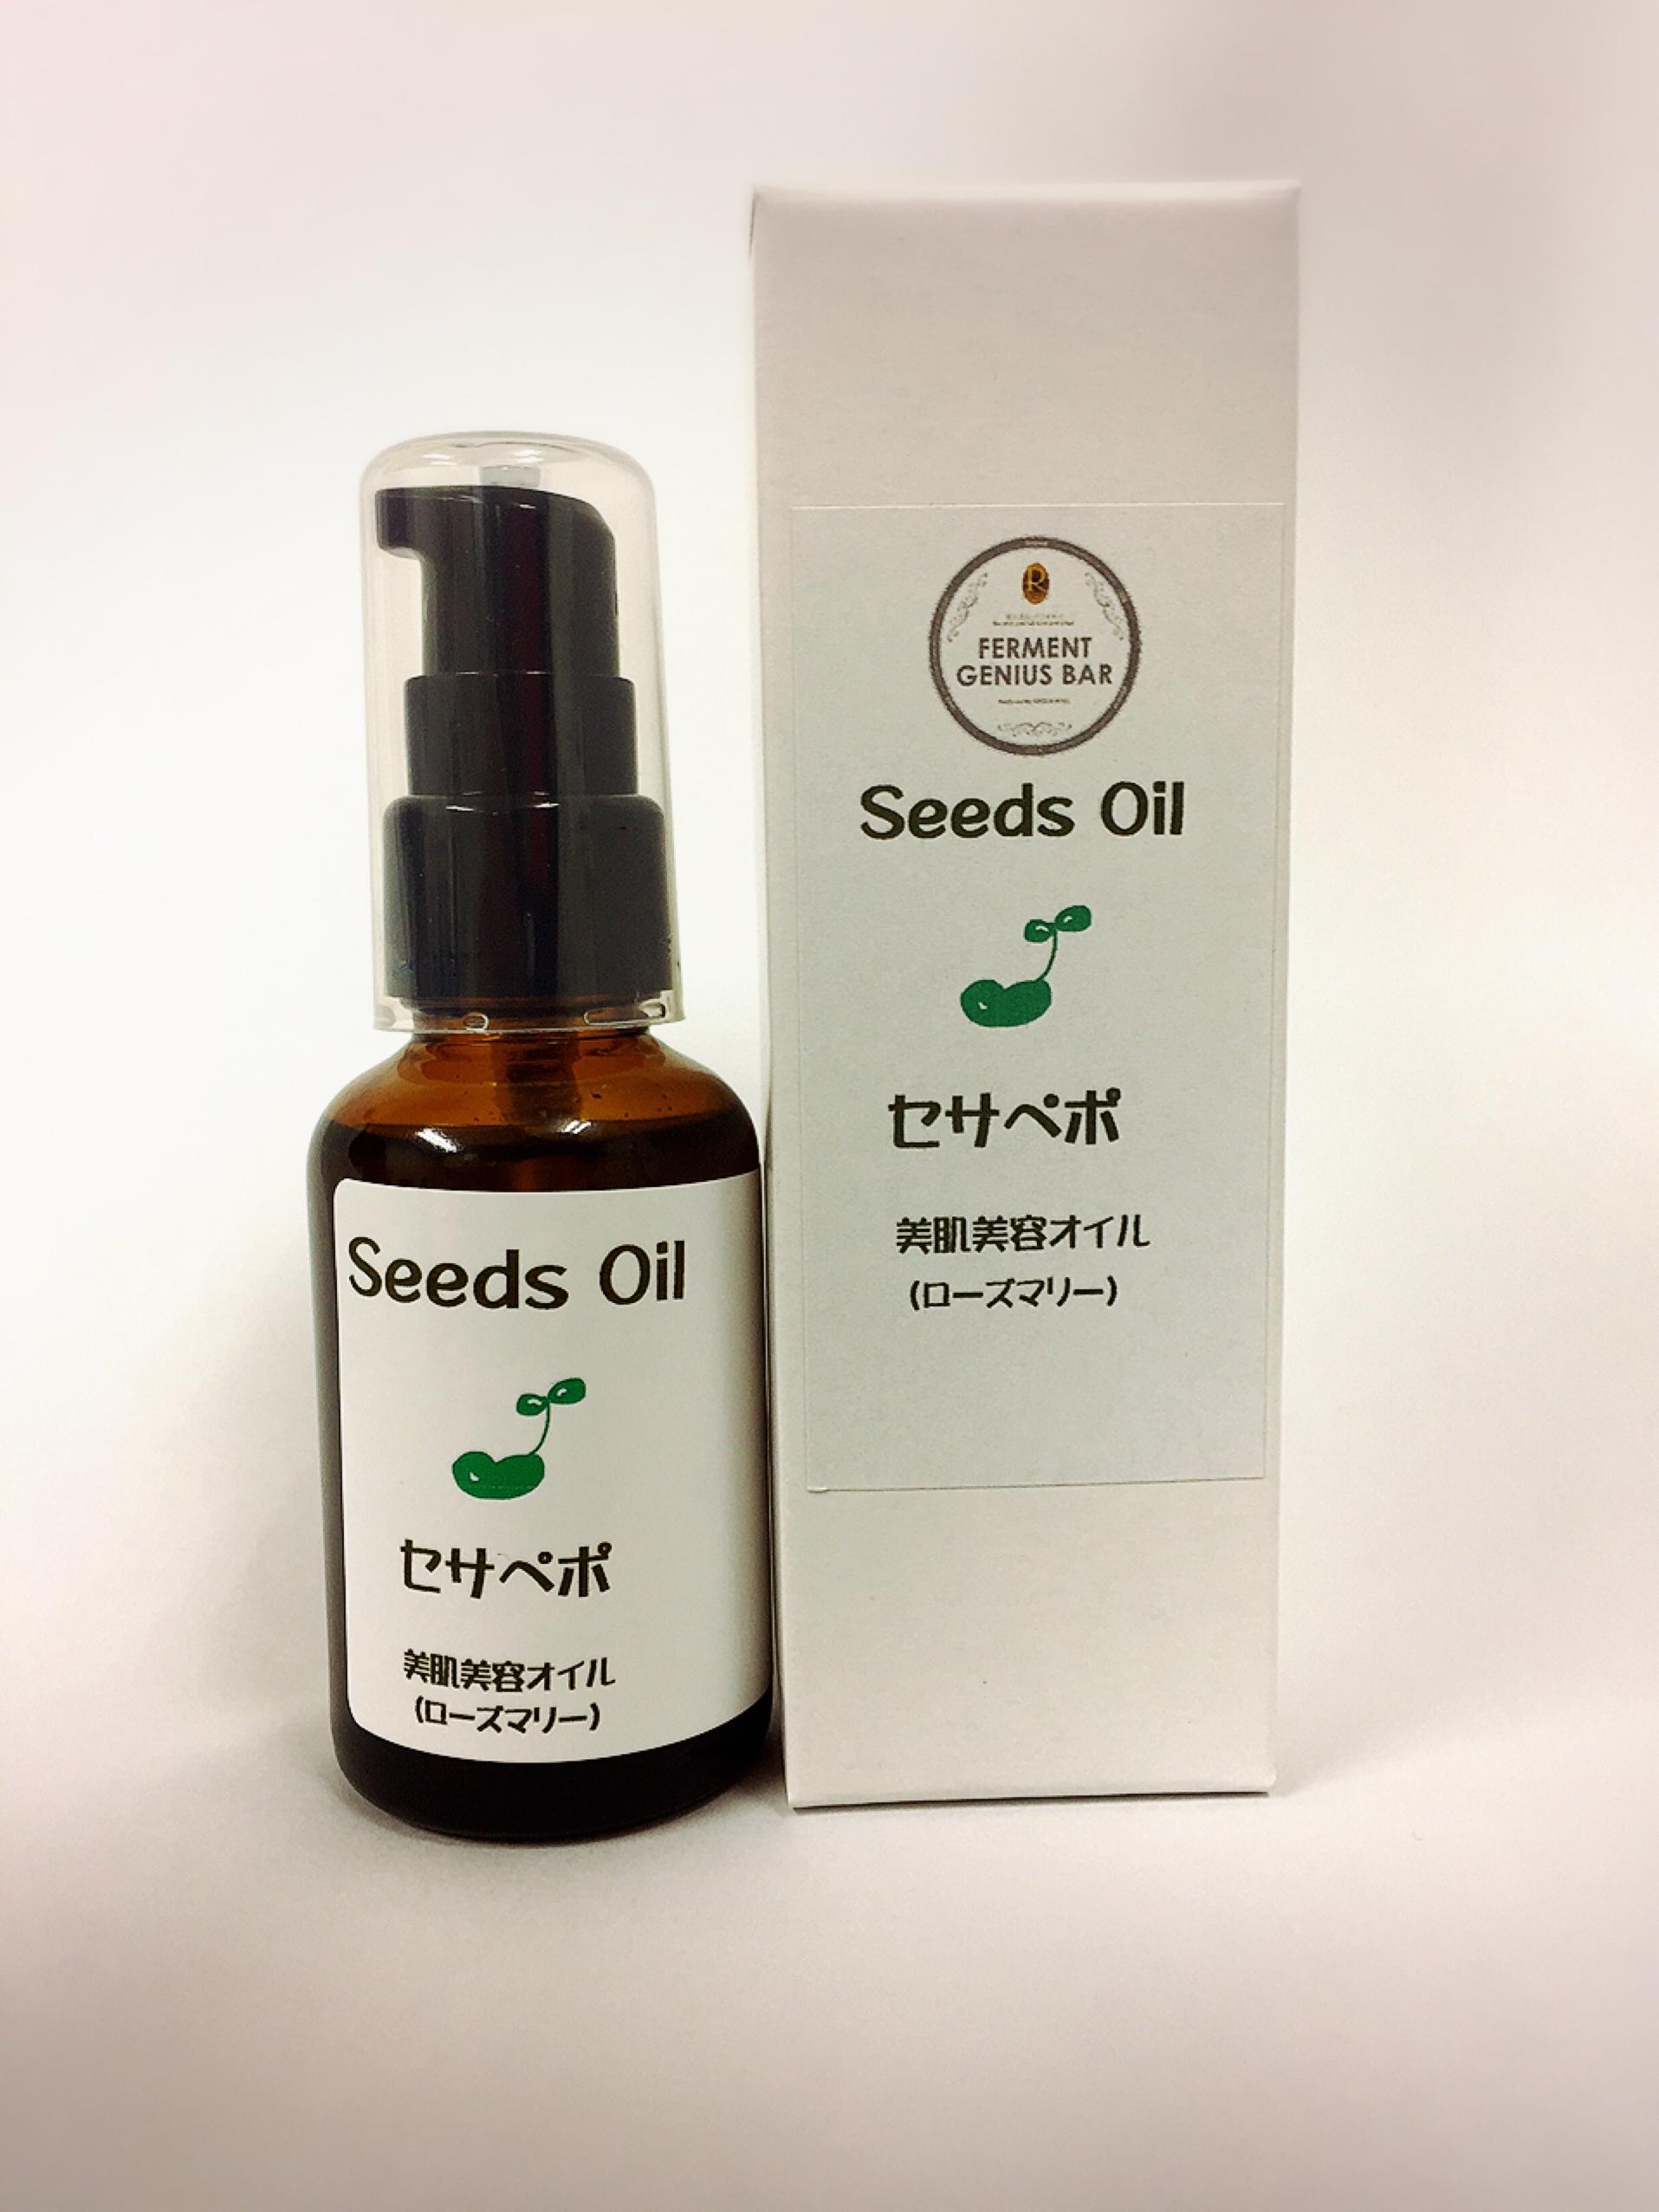 Seeds Oil【セサペポ&ローズマリー】香草美肌オイル30ml (スポイド)